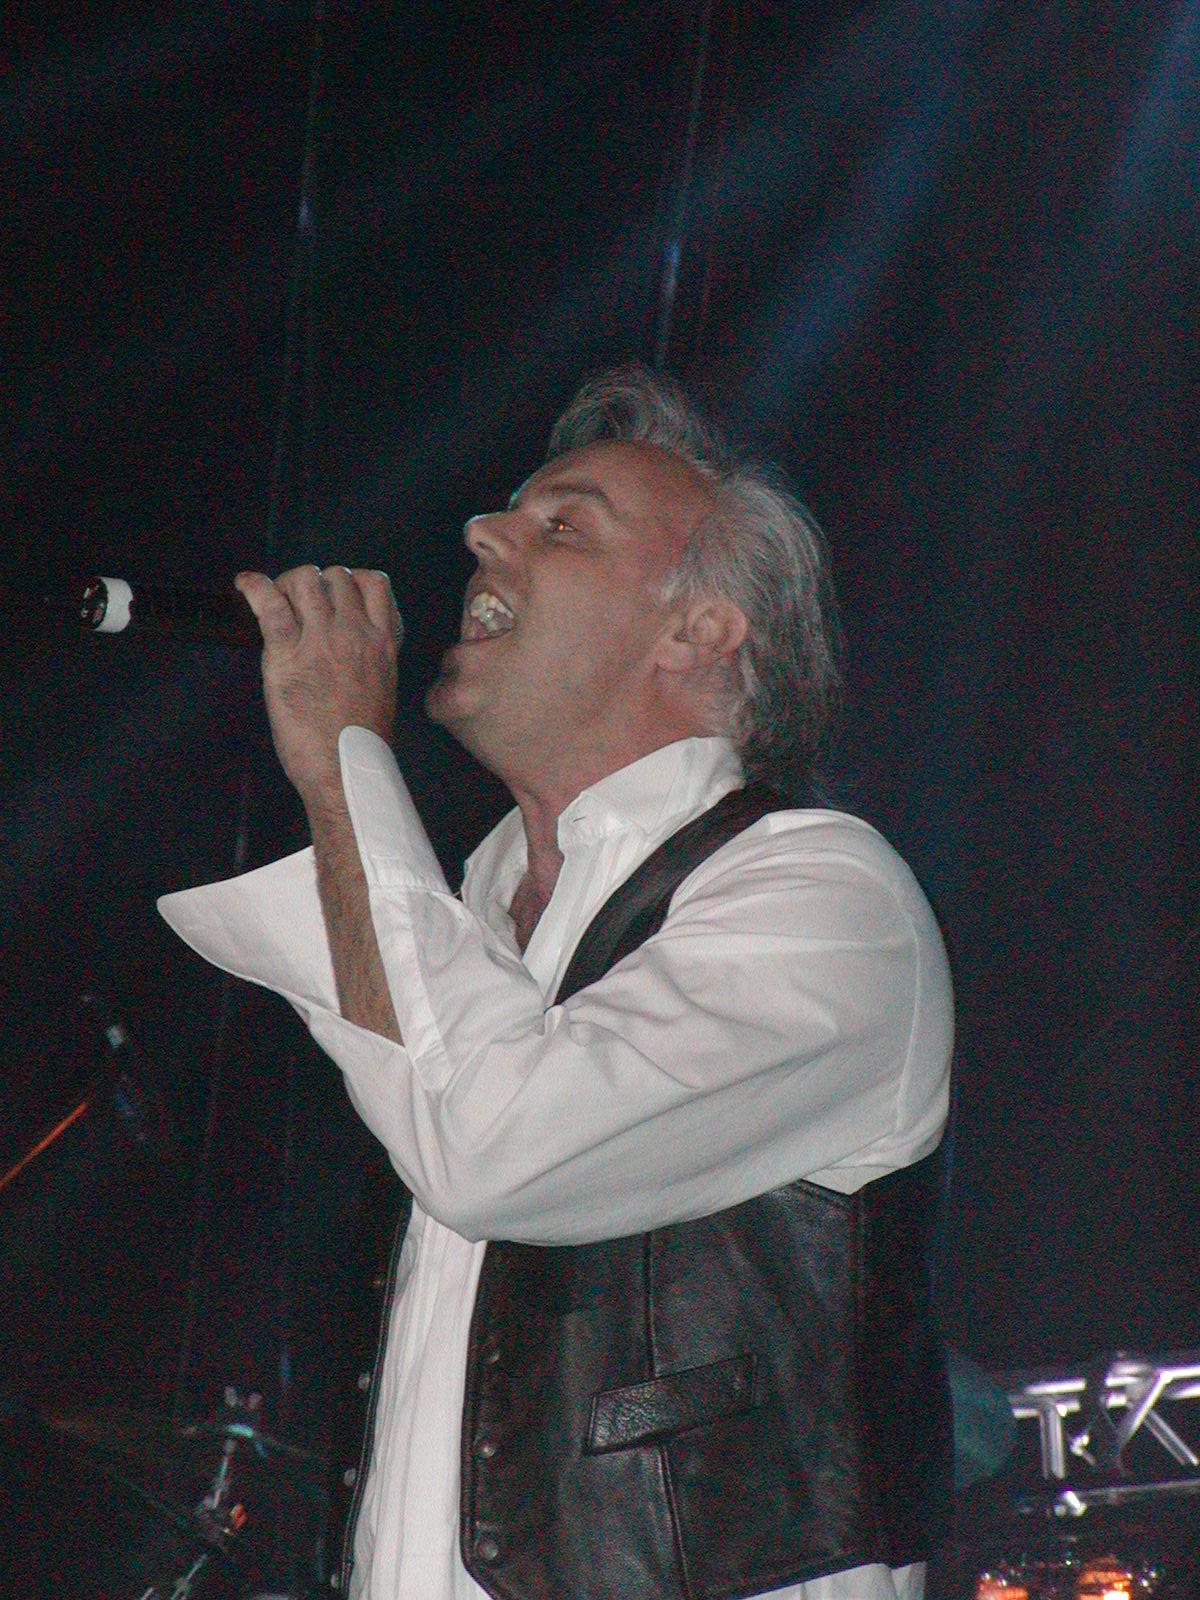 Joy – Valerie (Disco of the 80's Festival, Russia, 2002)